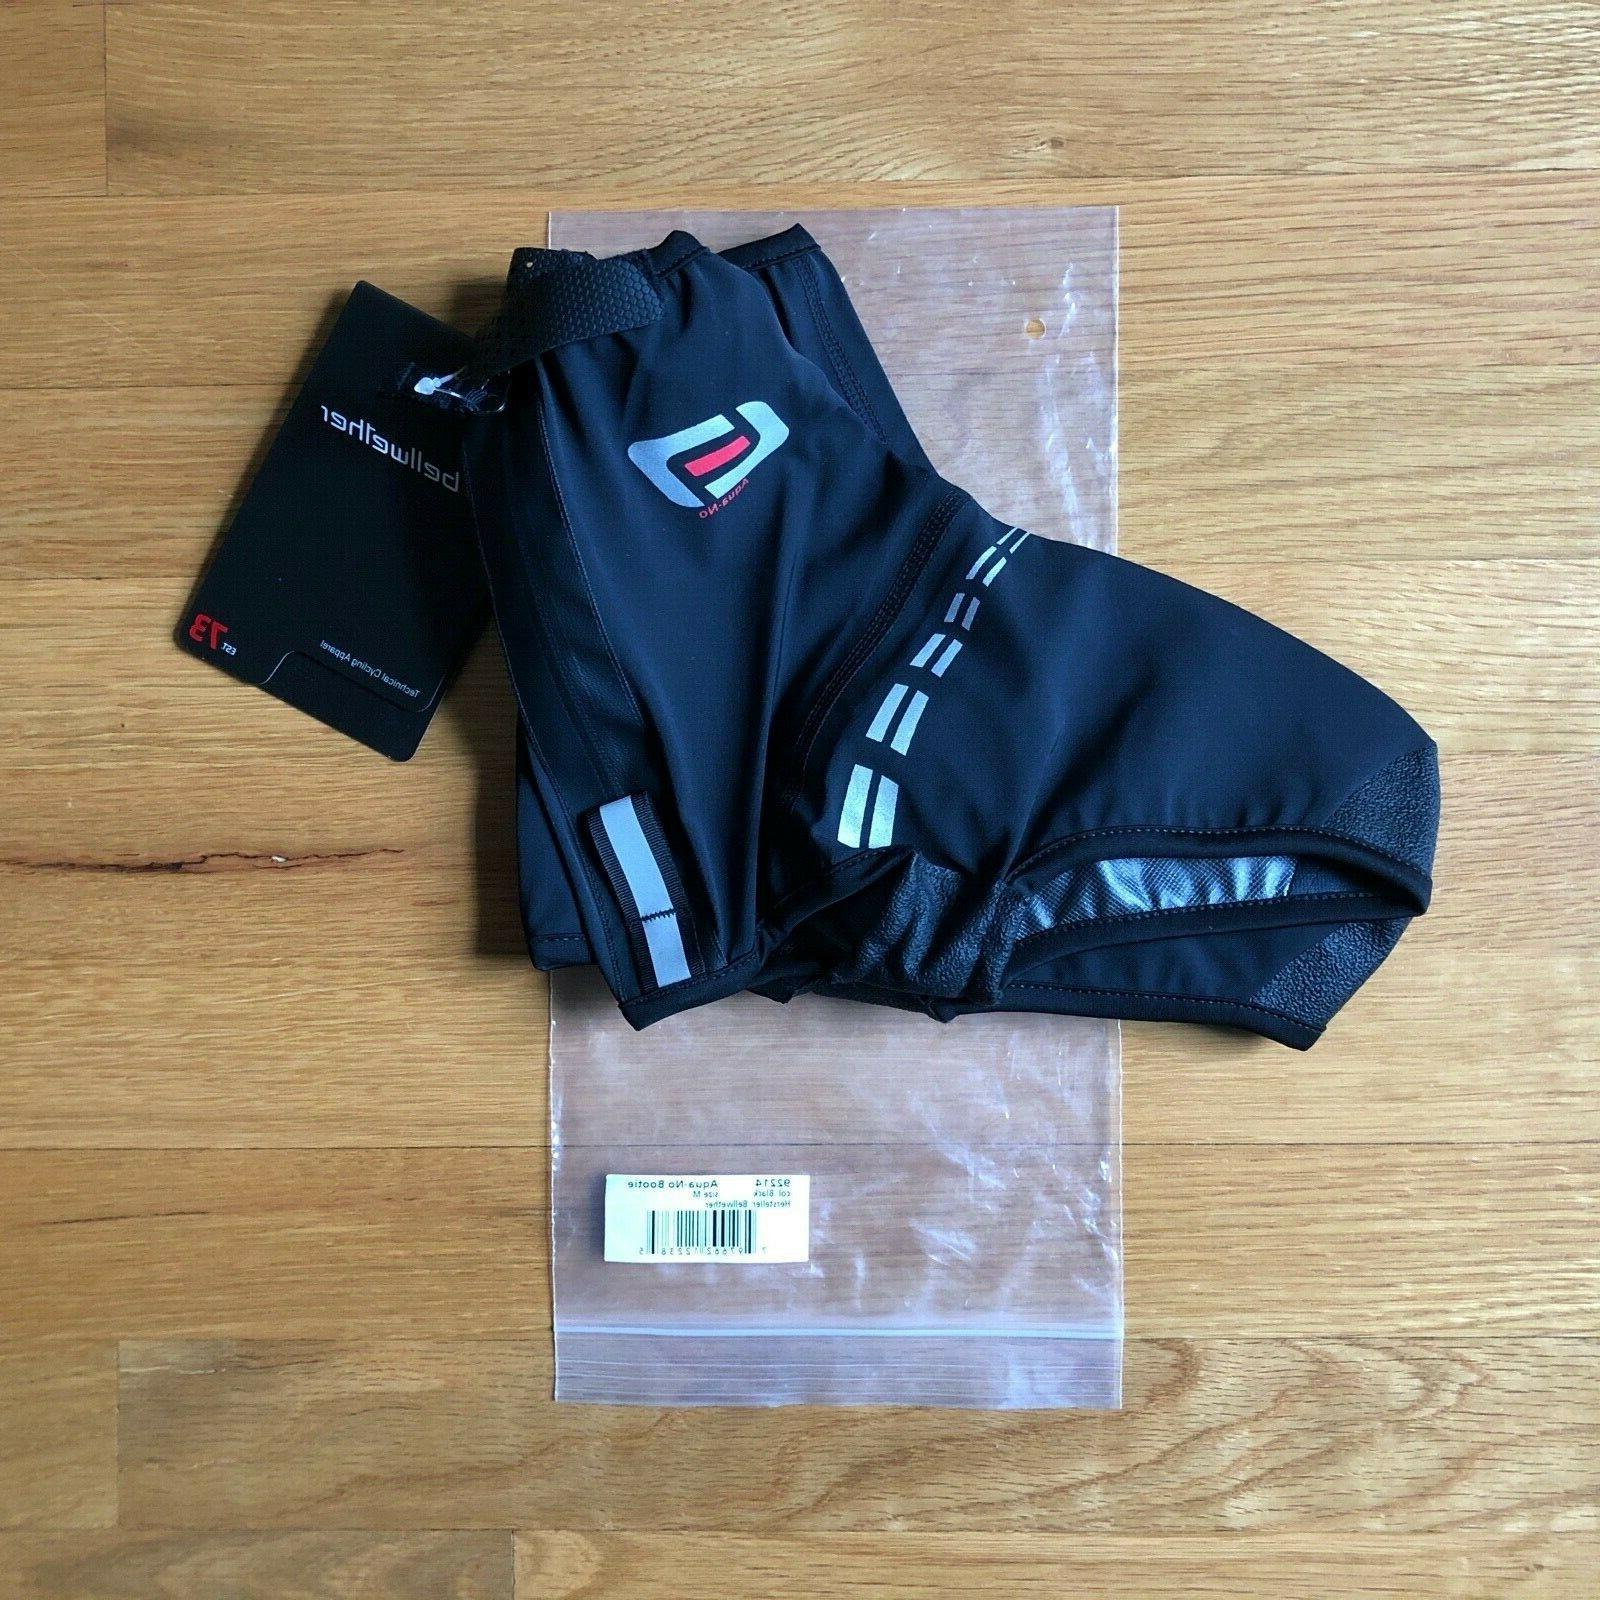 New Bellwether Aqua-No Waterproof Over Cycling Bike